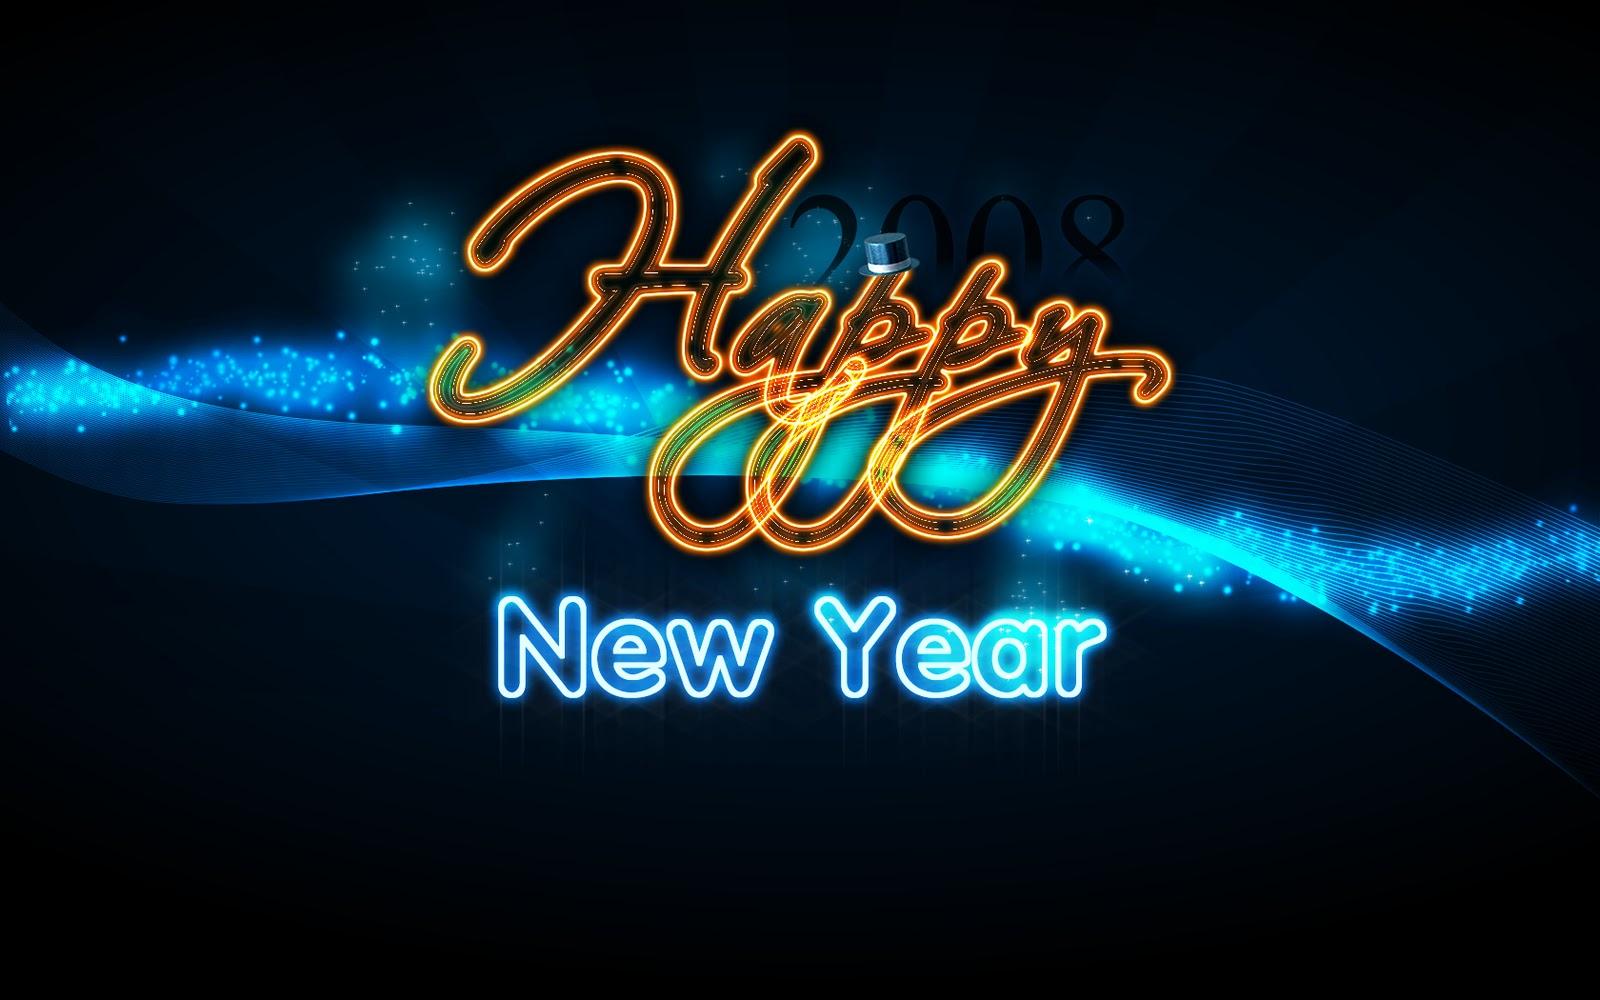 New Year Desktop Backgrounds 1600x1000